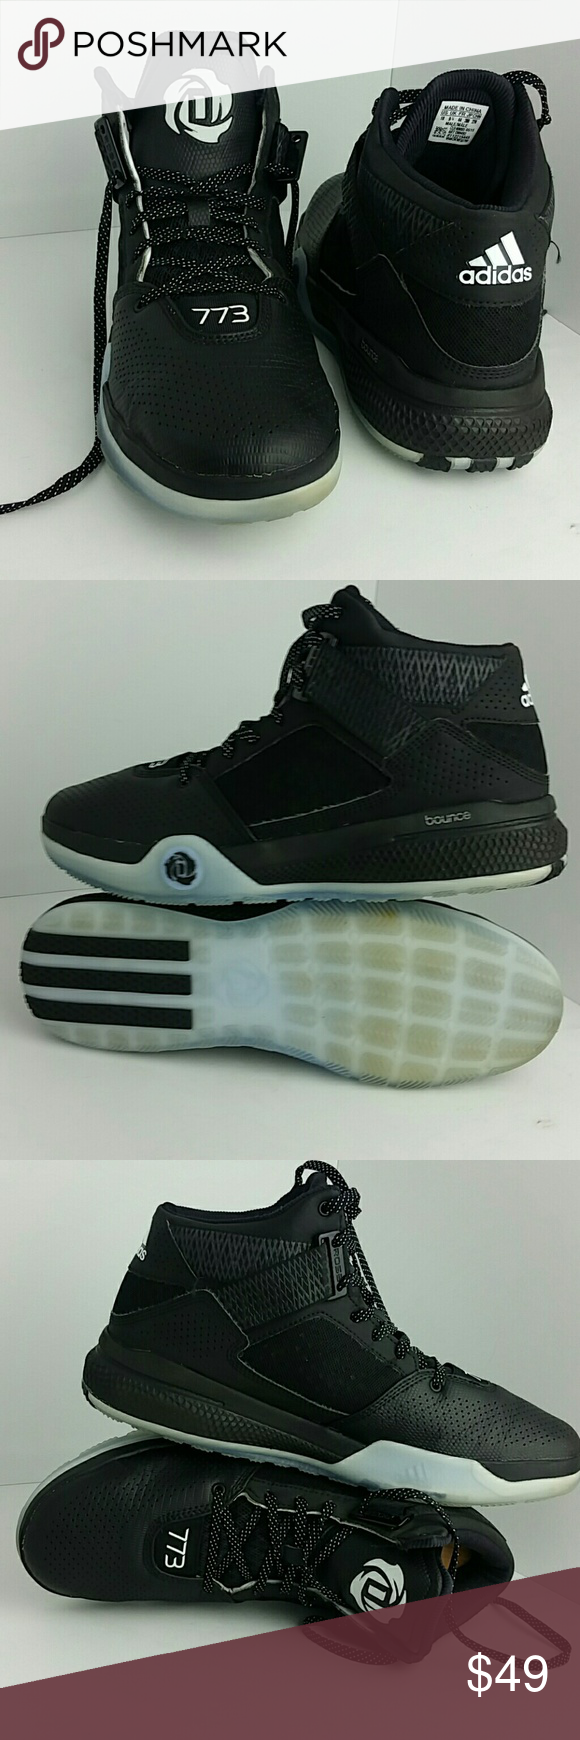 hot sale online d87d7 13210 ADIDAS D ROSS 773 MENS SHOES VERY CLEAN INSIDE-OUT SKE  KM5-PO ADIDAS  Shoes Athletic Shoes